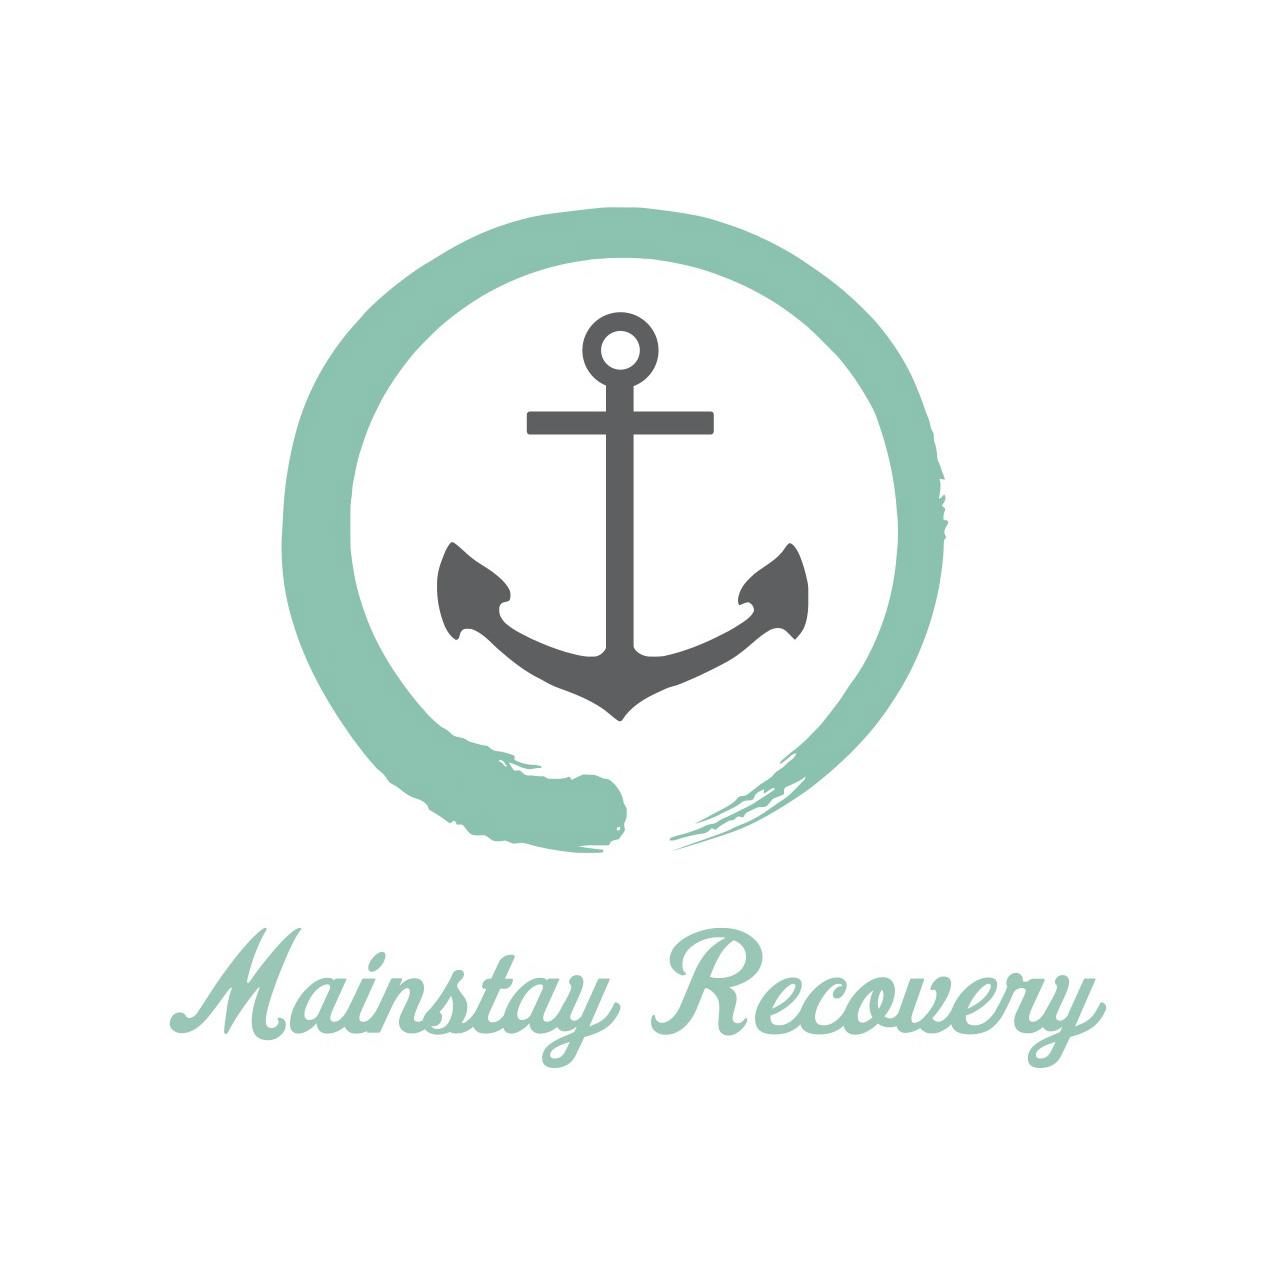 Mainstay Recovery